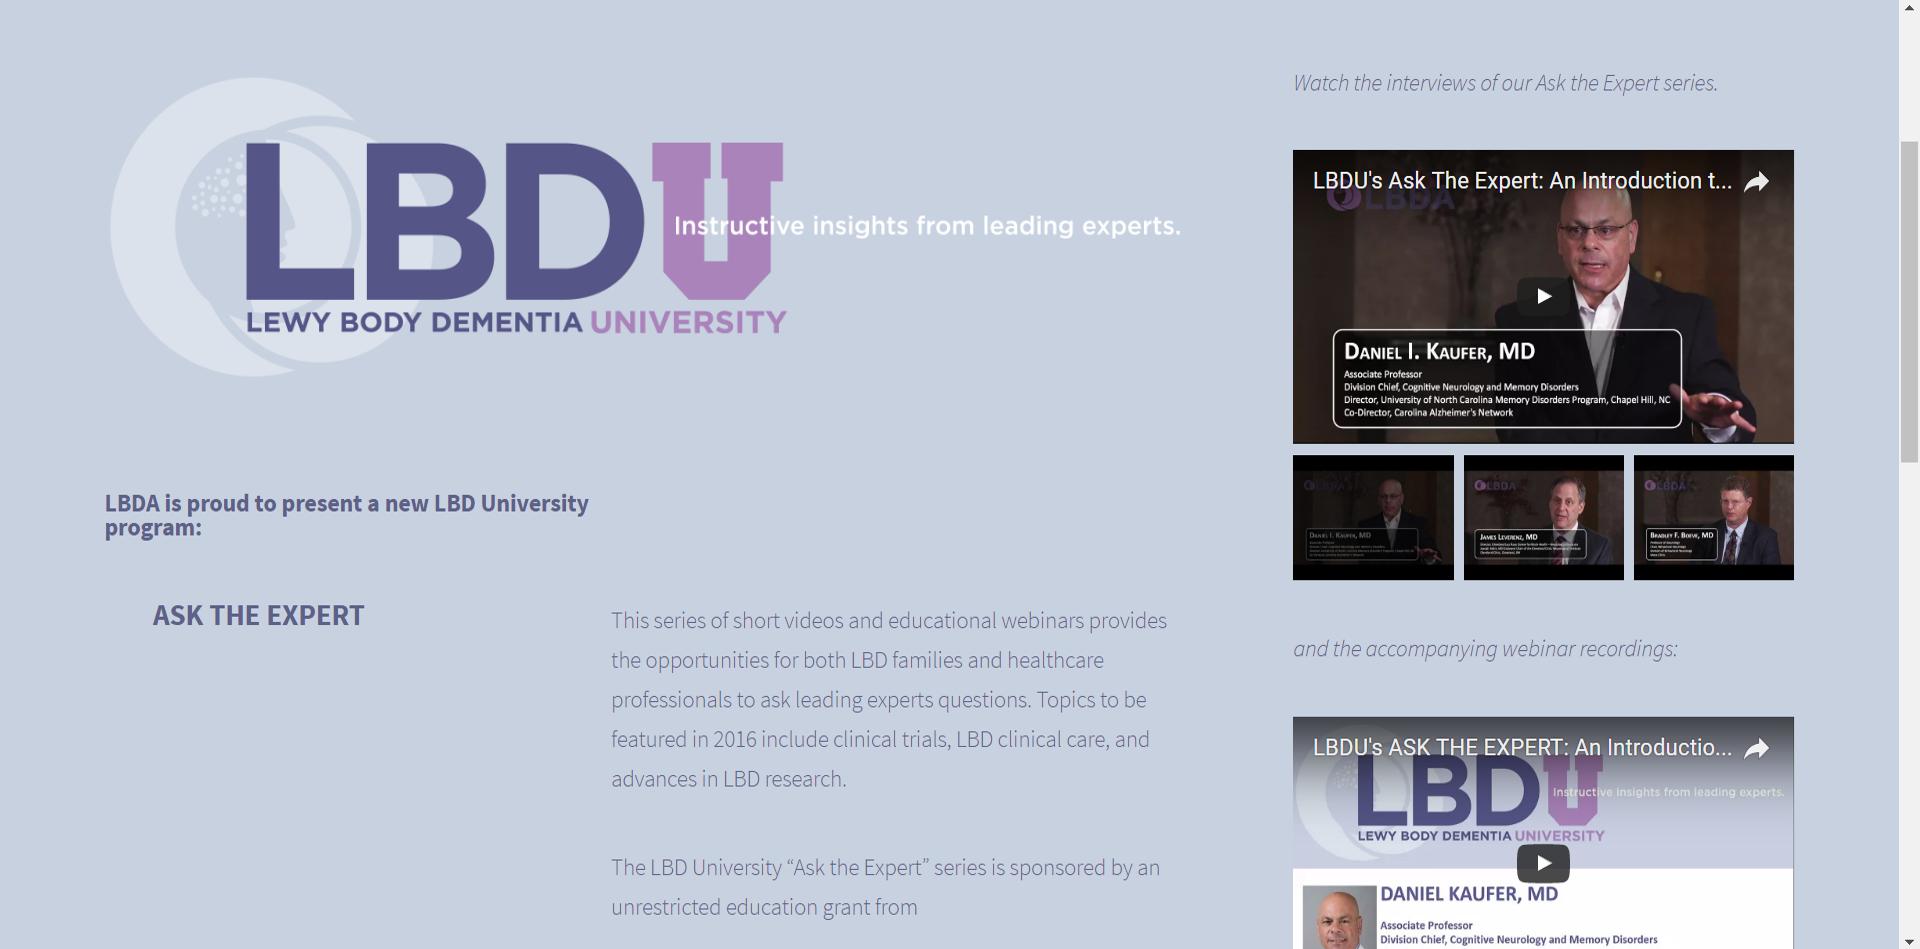 LBDA interviews and webinar series